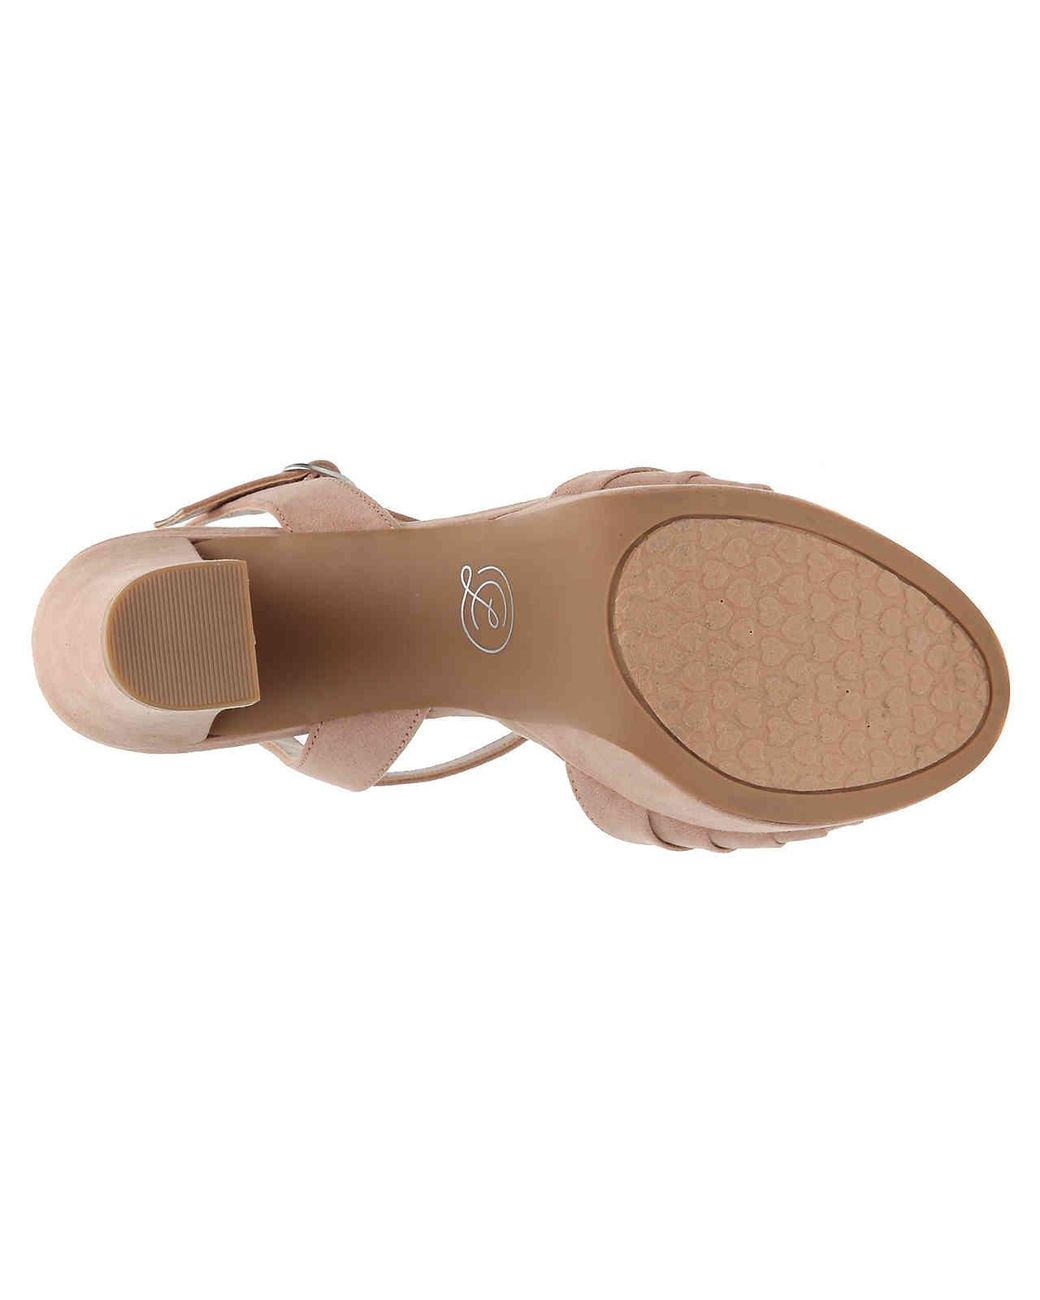 4a22fbb9216 Lyst - Chinese Laundry Allie Platform Sandal